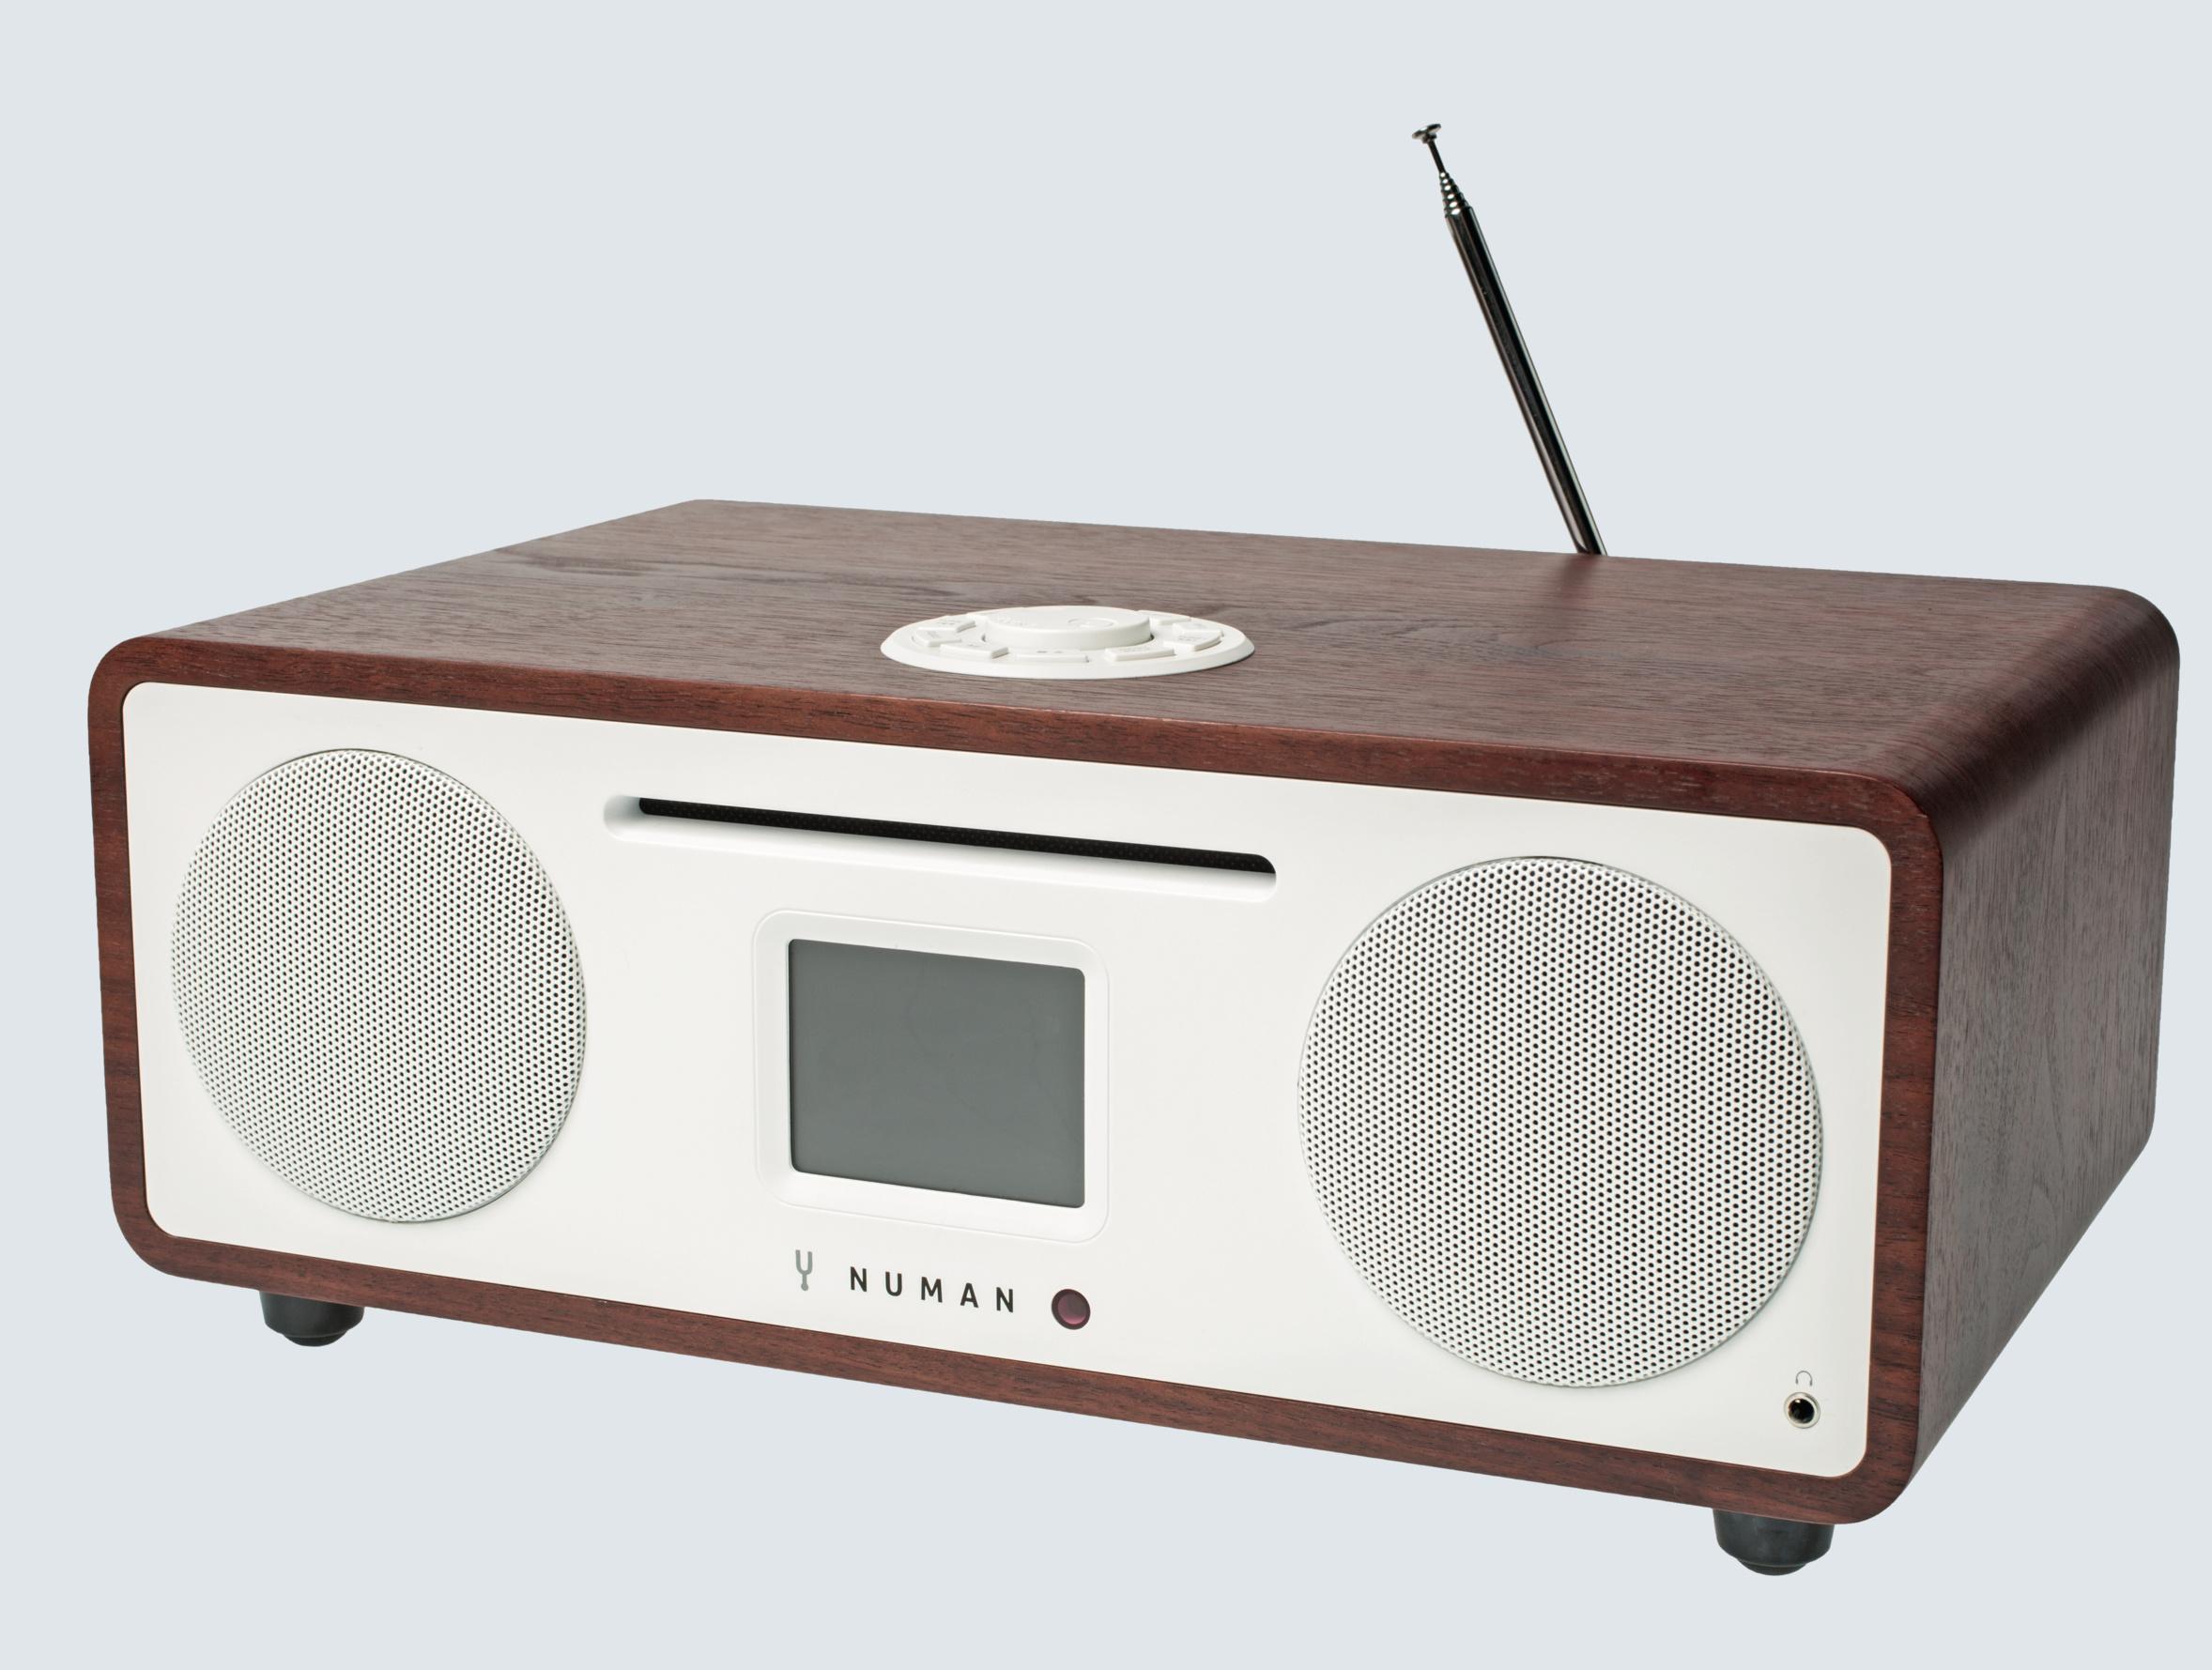 hybridradios f r fm dab internetradio und streaming c. Black Bedroom Furniture Sets. Home Design Ideas